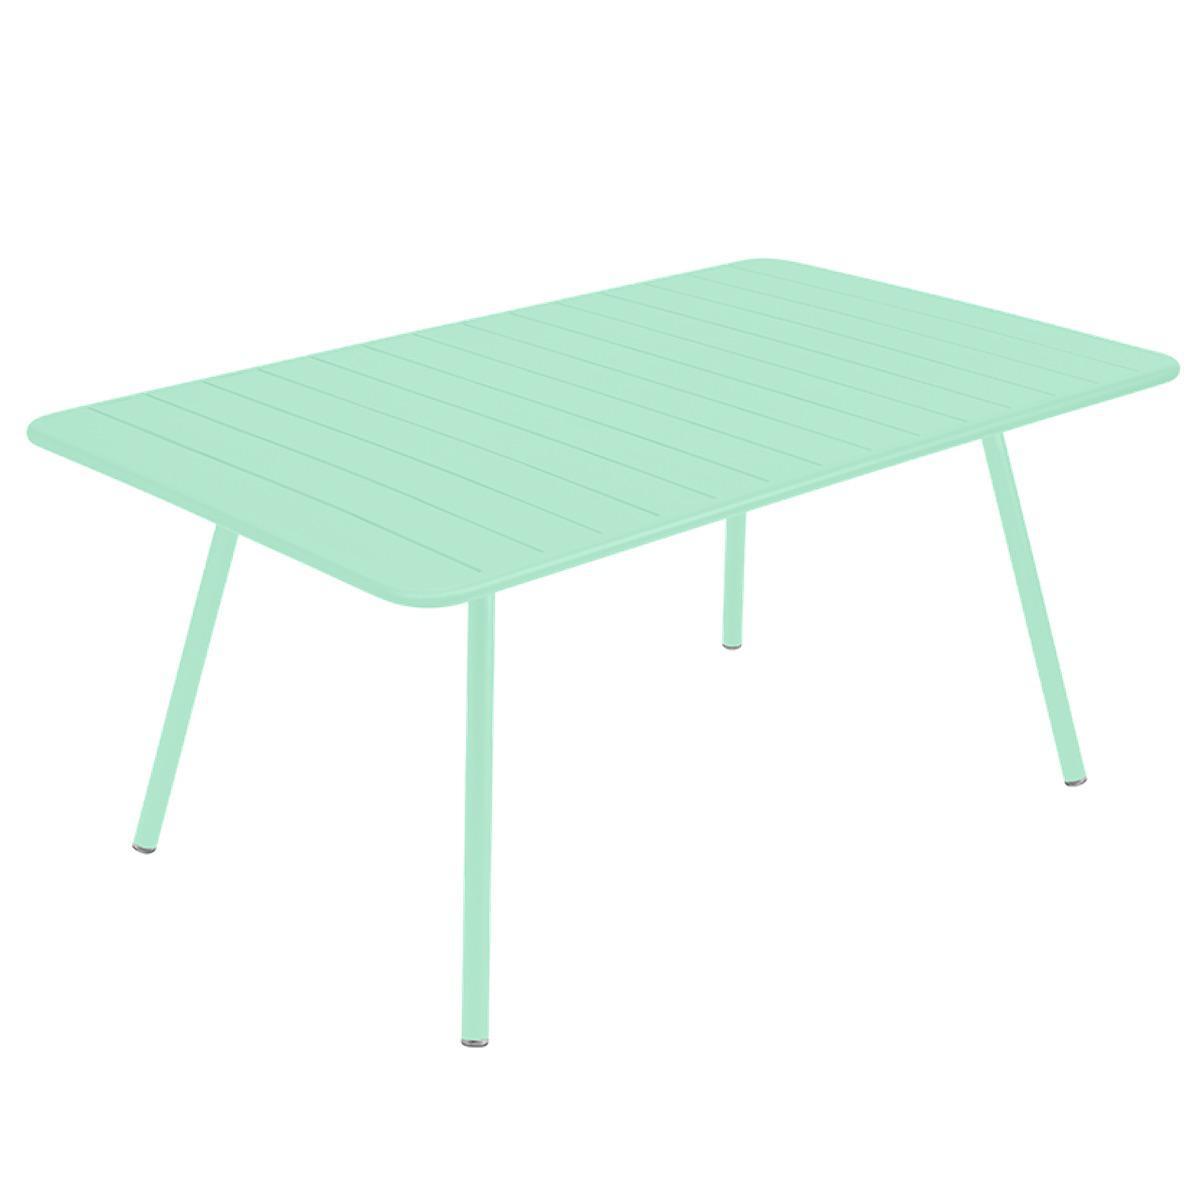 Table 165x100cm LUXEMBOURG Fermob vert opaline